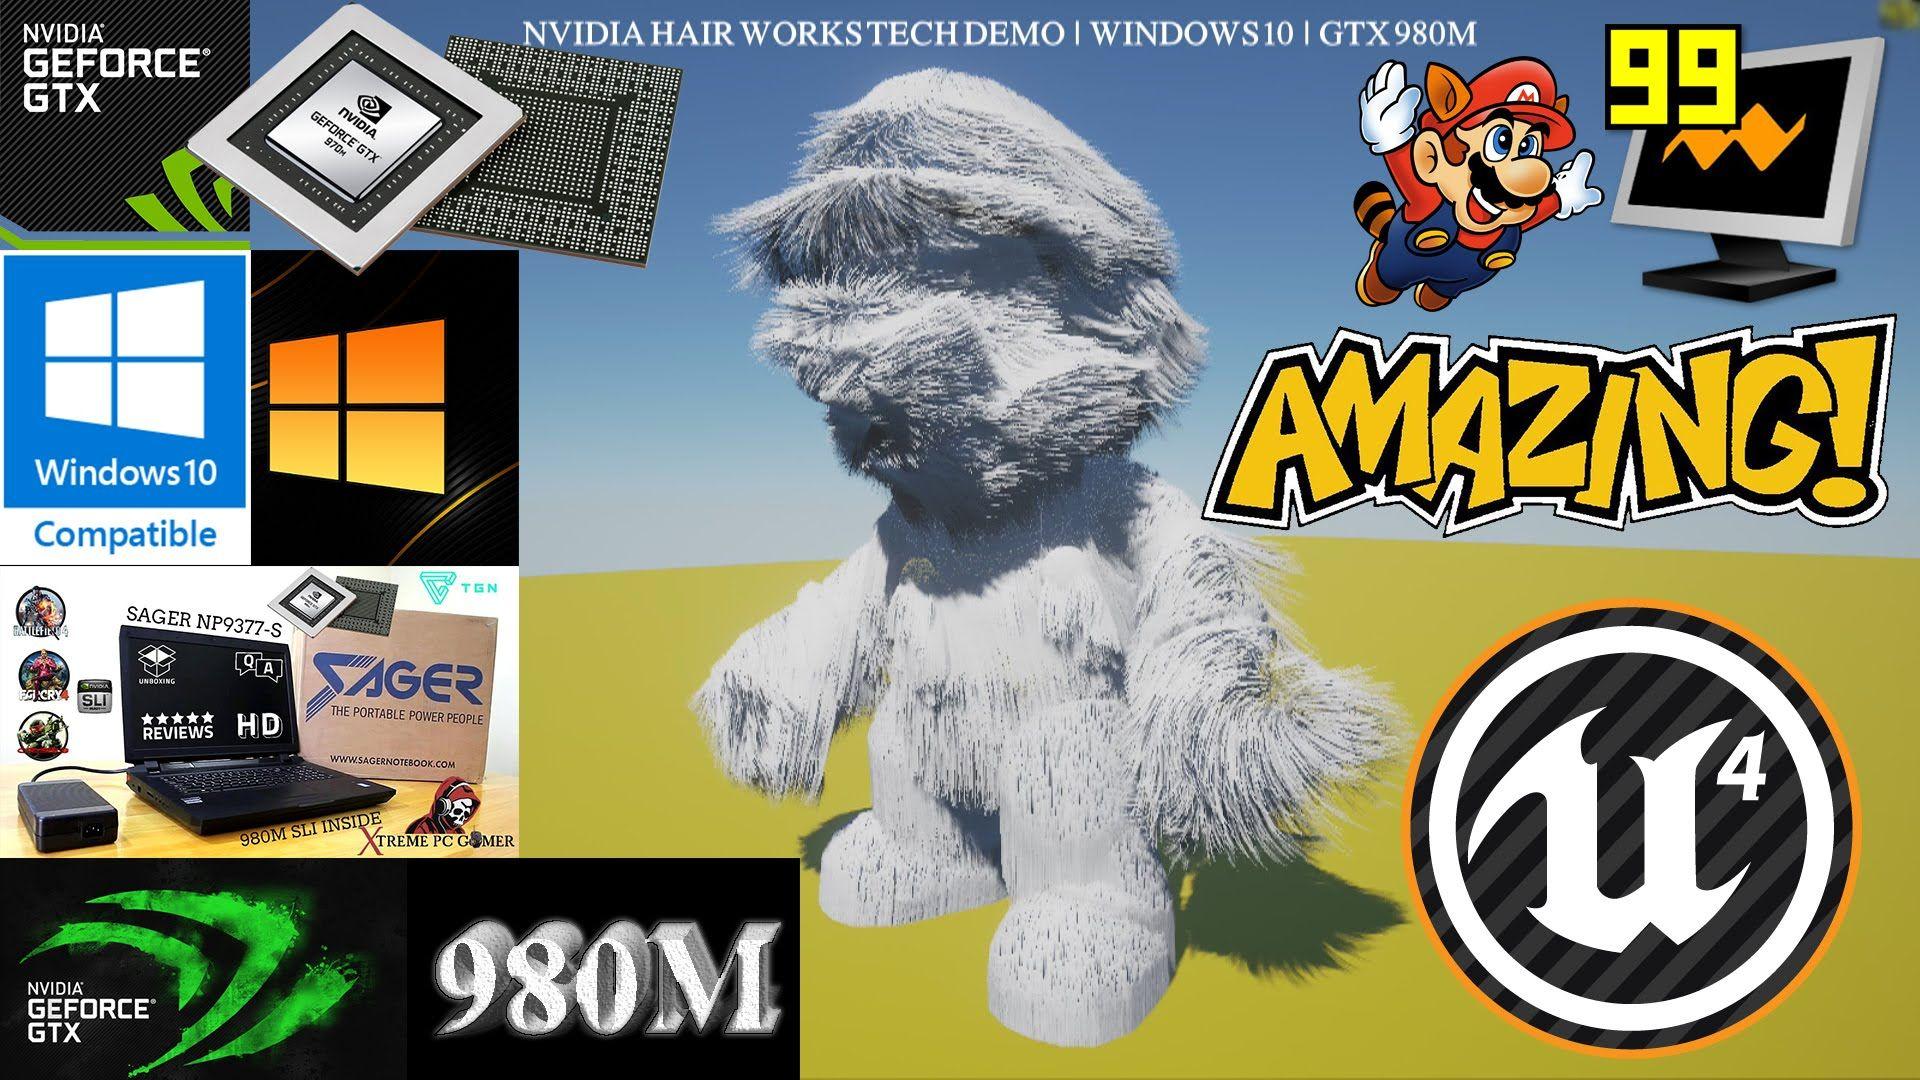 Windows 10 | Unreal Engine 4 [4 8] | Super Mario / Nvidia